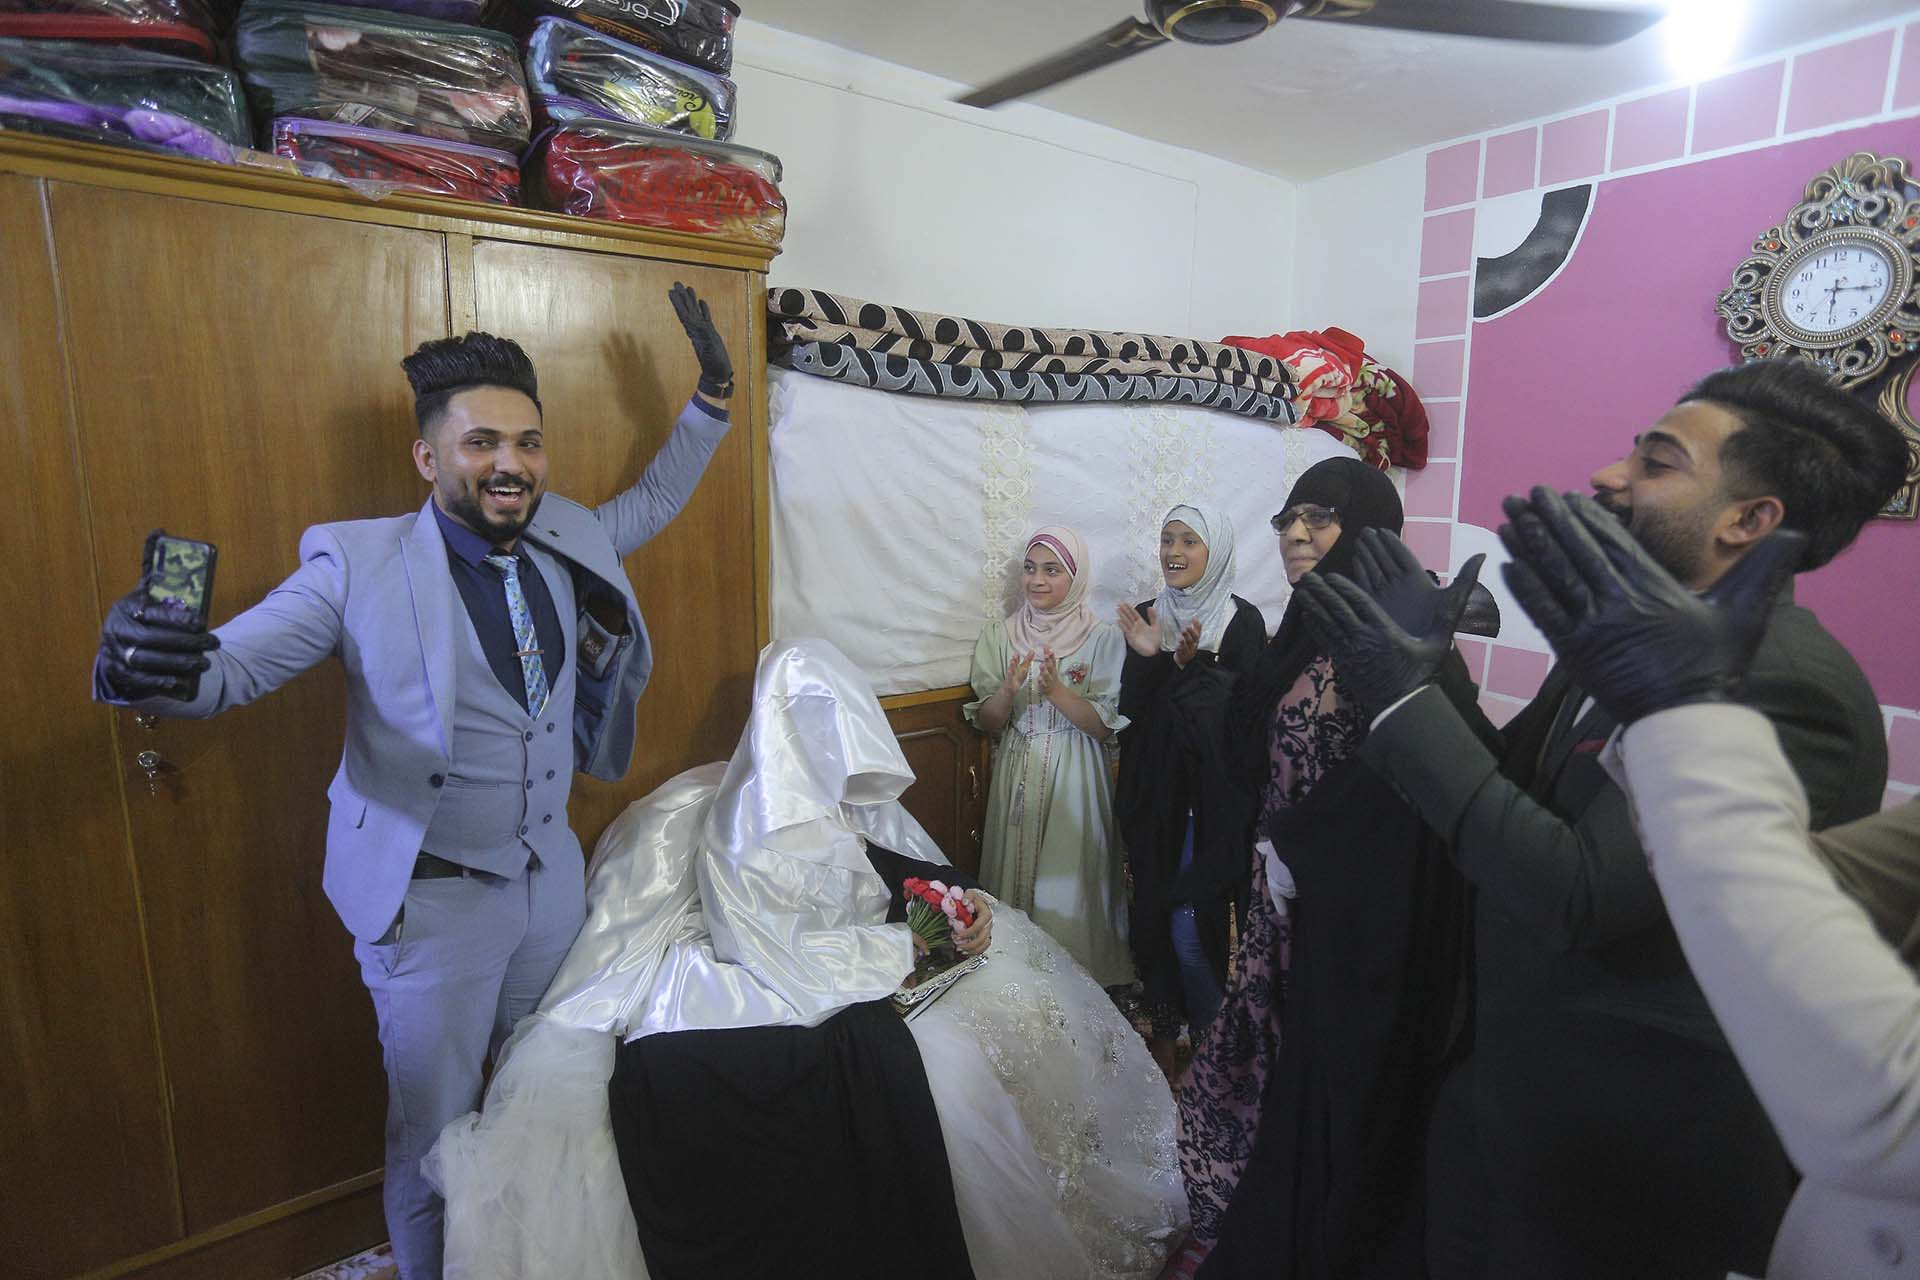 Ahmed Khaled al-Kaabi y su prometida Ruqaya Rahim celebran su boda en Najaf, Irak (AP Photo/Anmar Khalil)